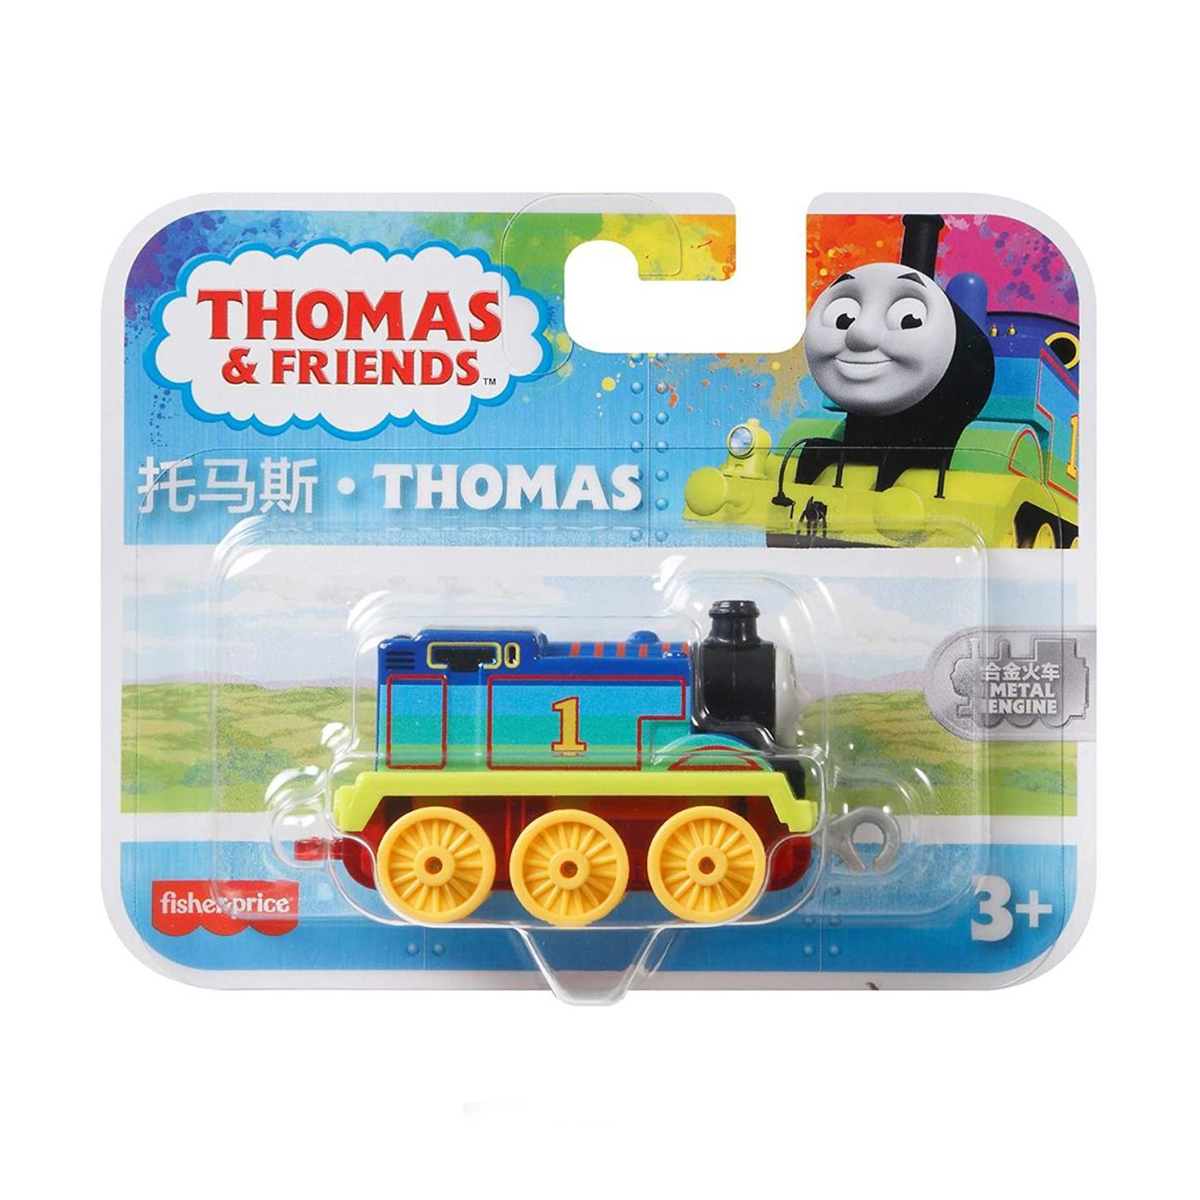 Locomotiva Thomas and Friends, GYV69